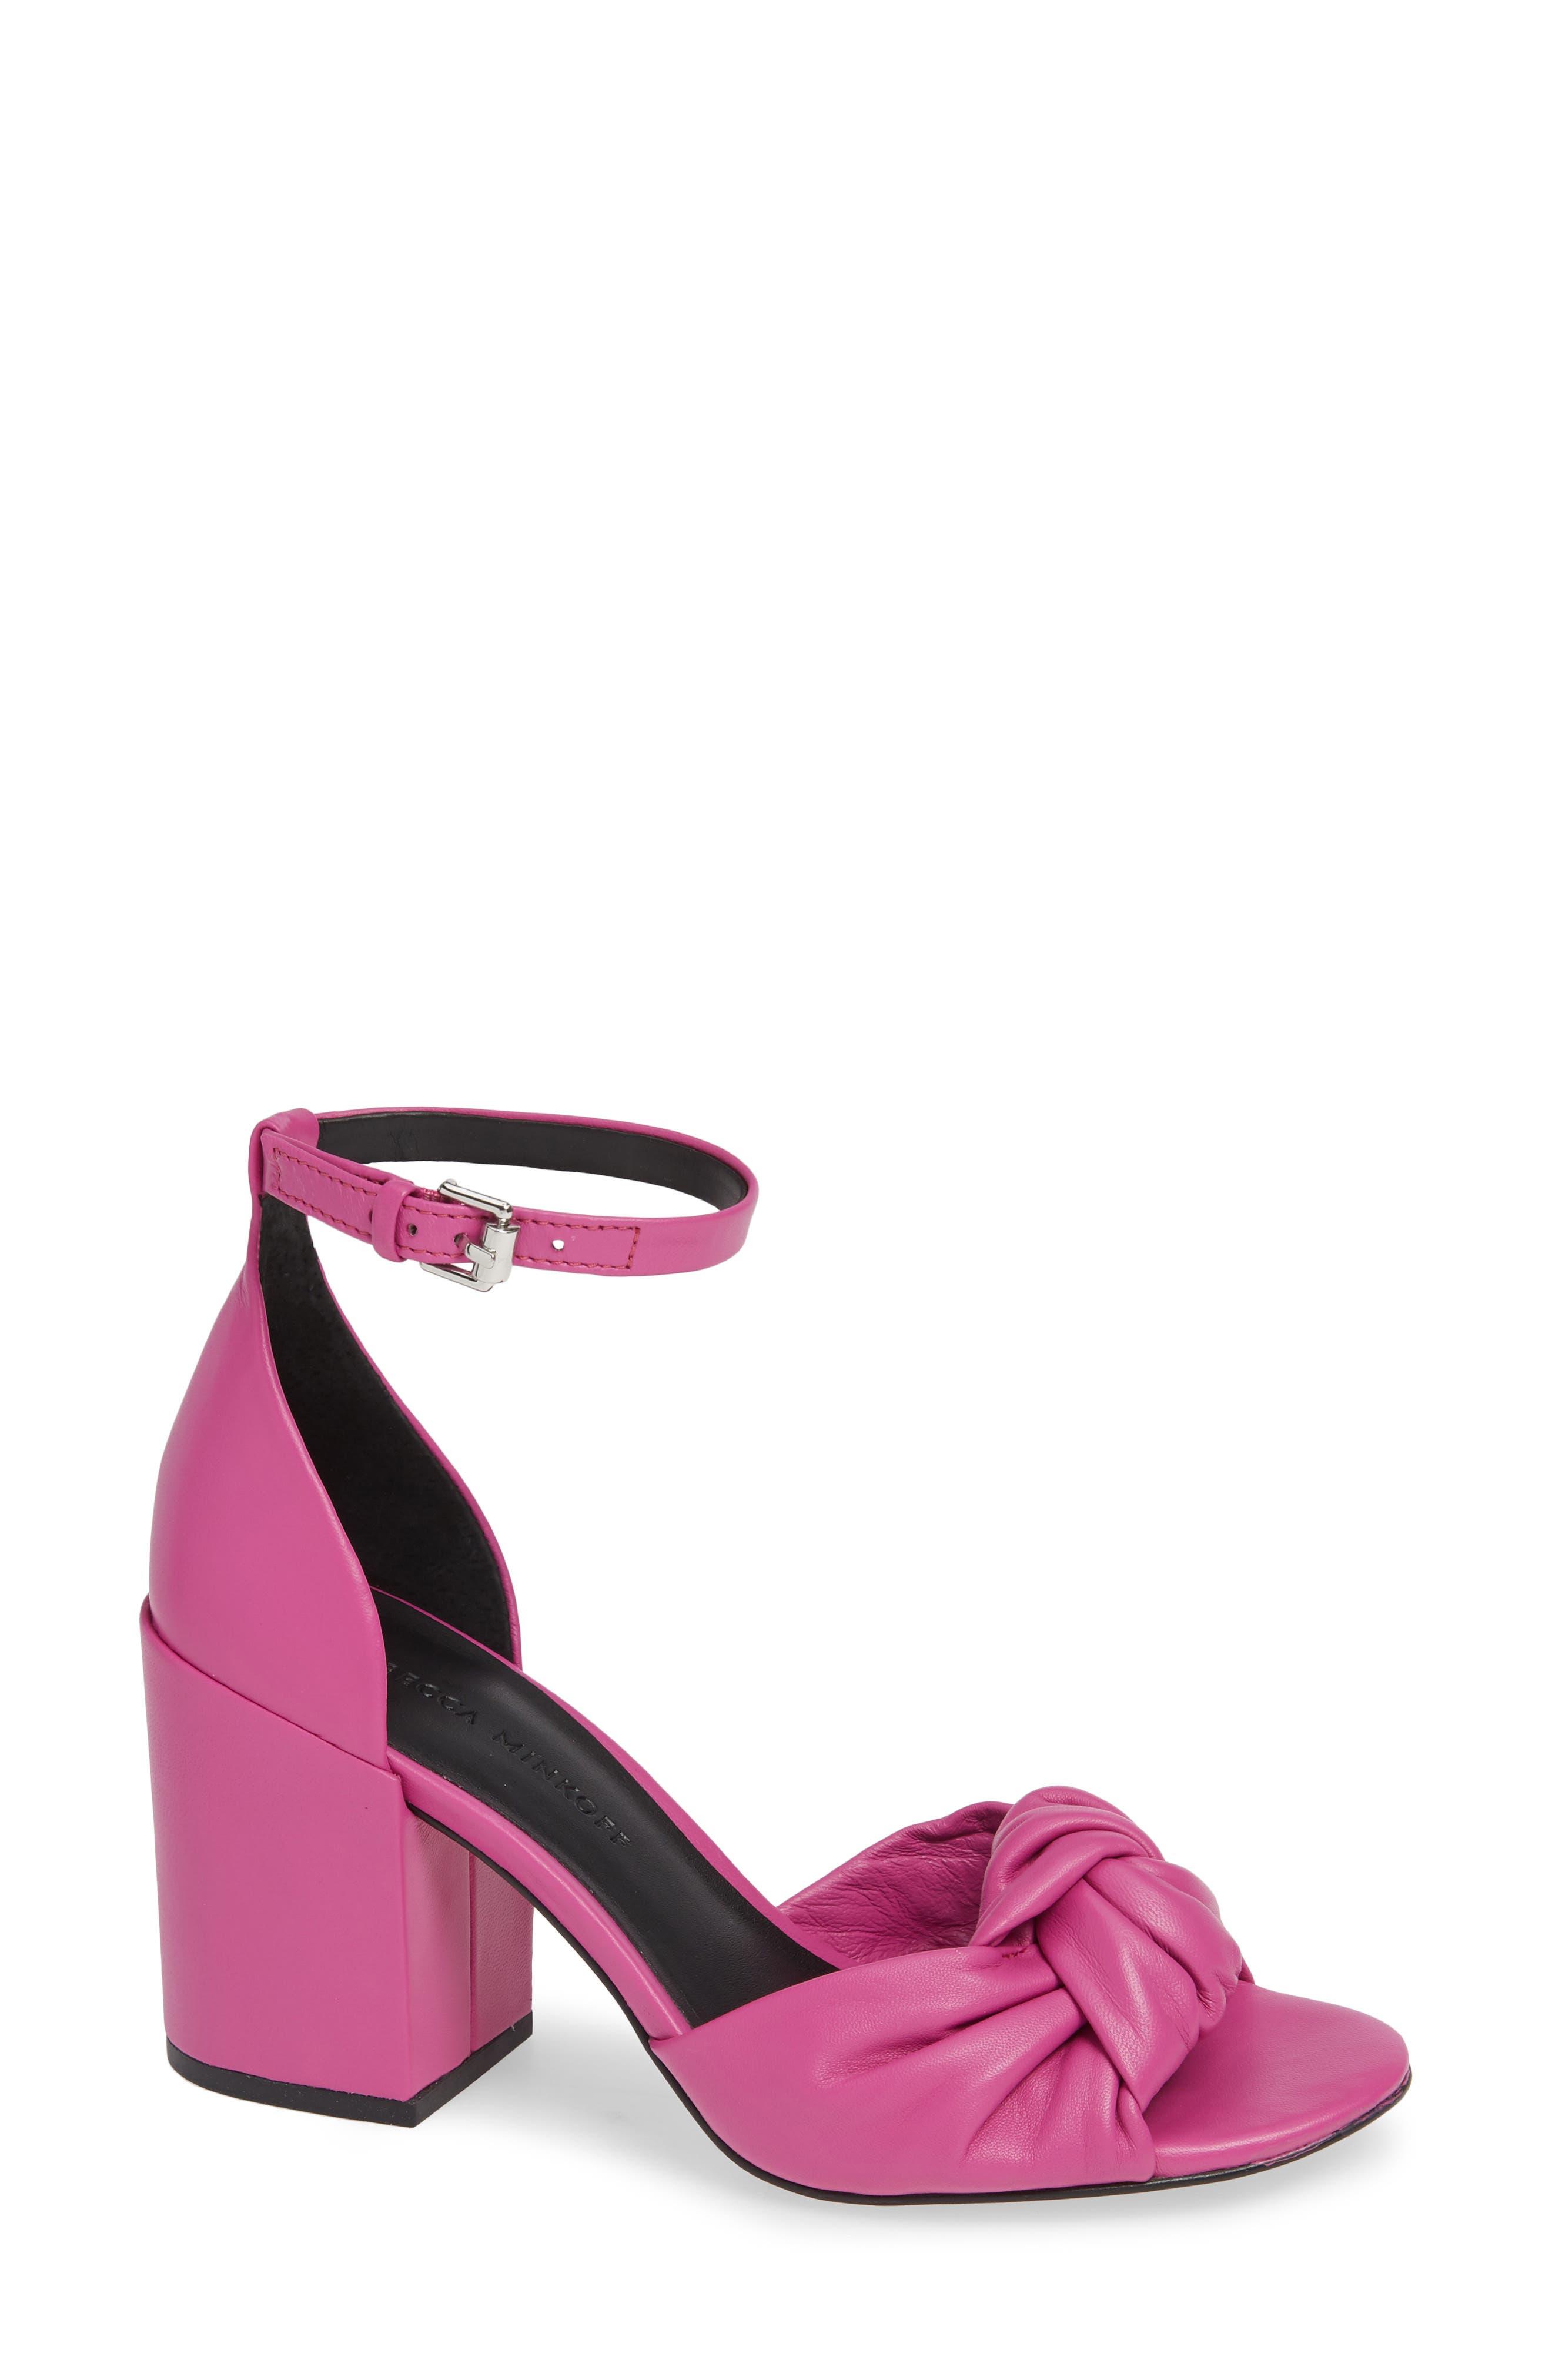 Rebecca Minkoff Capriana Ankle Strap Sandal- Pink